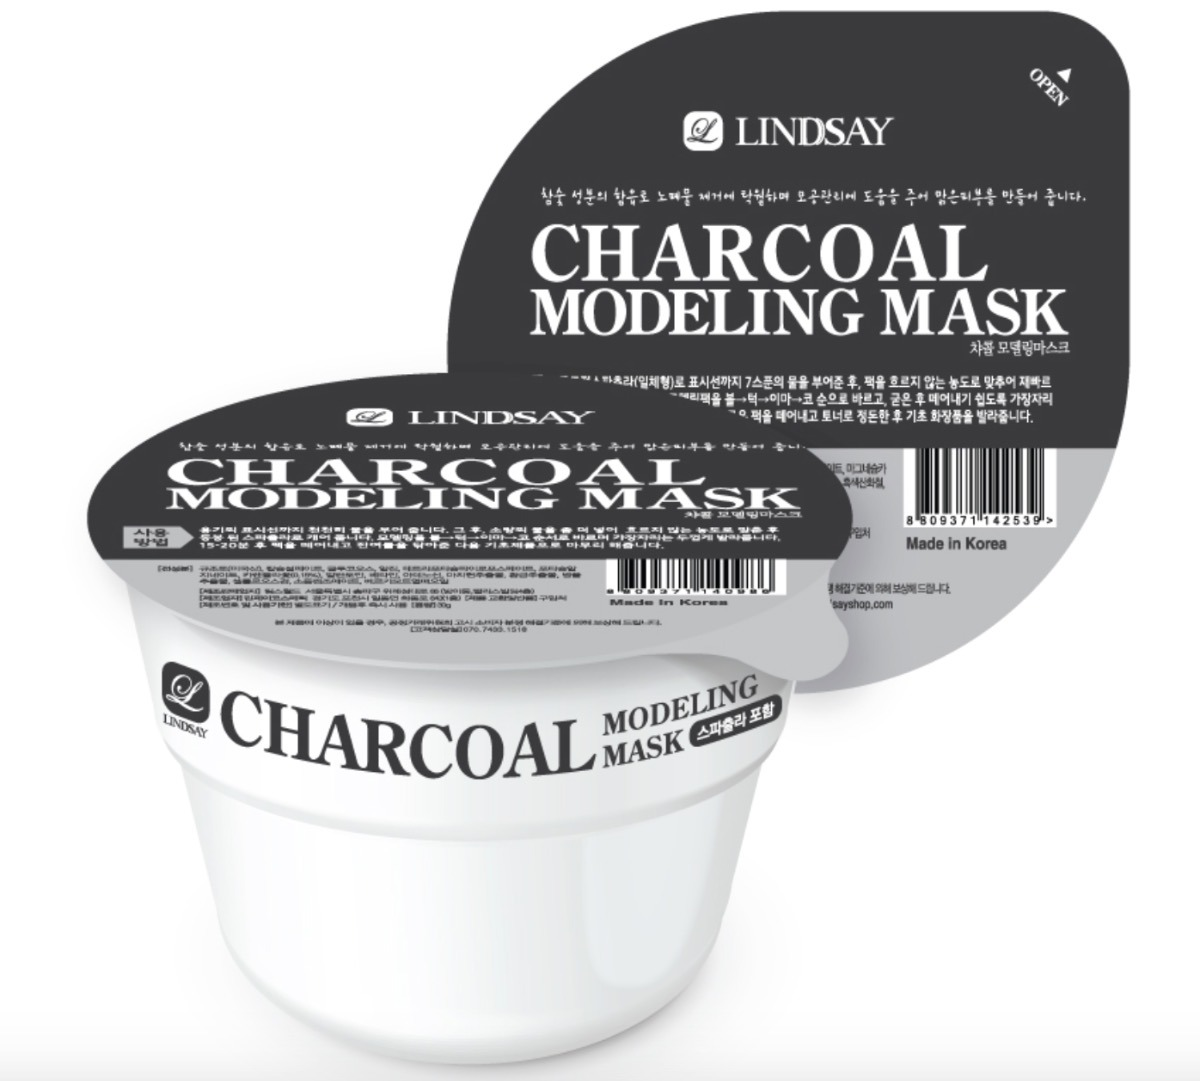 db977f8348e Lindsay Modeling Mask Carbon Mascarilla Coreana Goma -   130.00 en ...